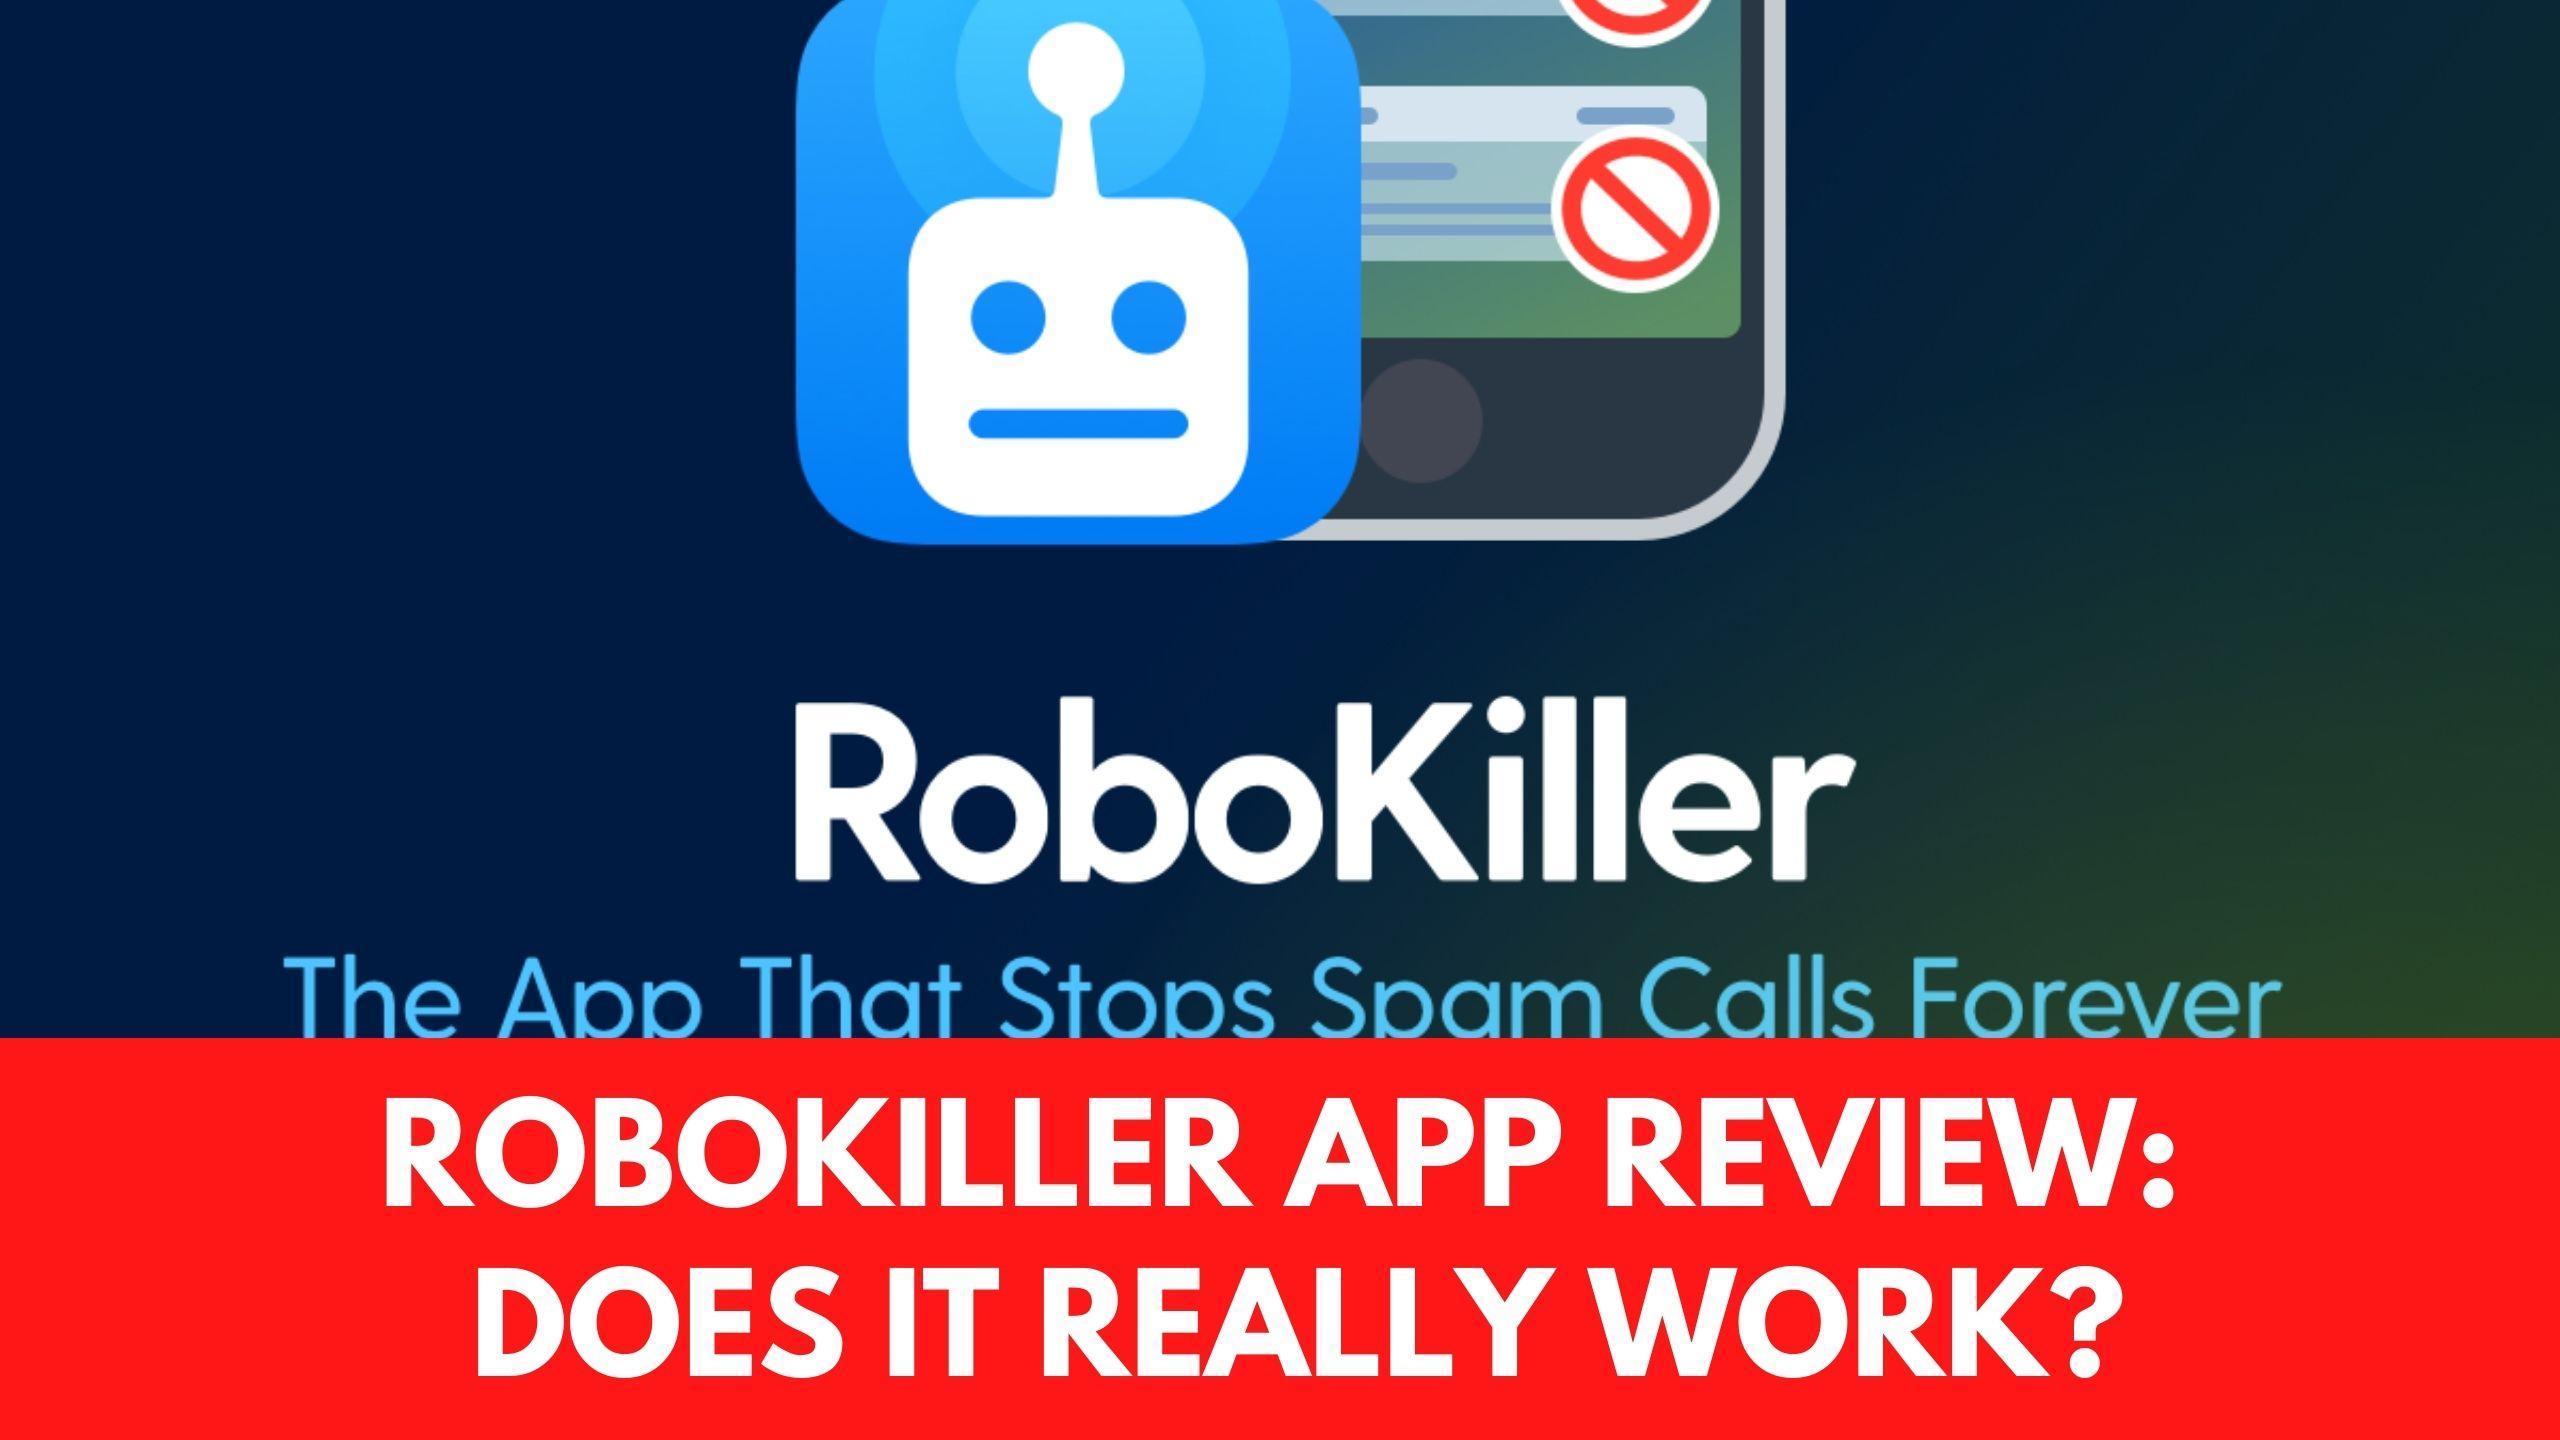 RoboKiller App Review